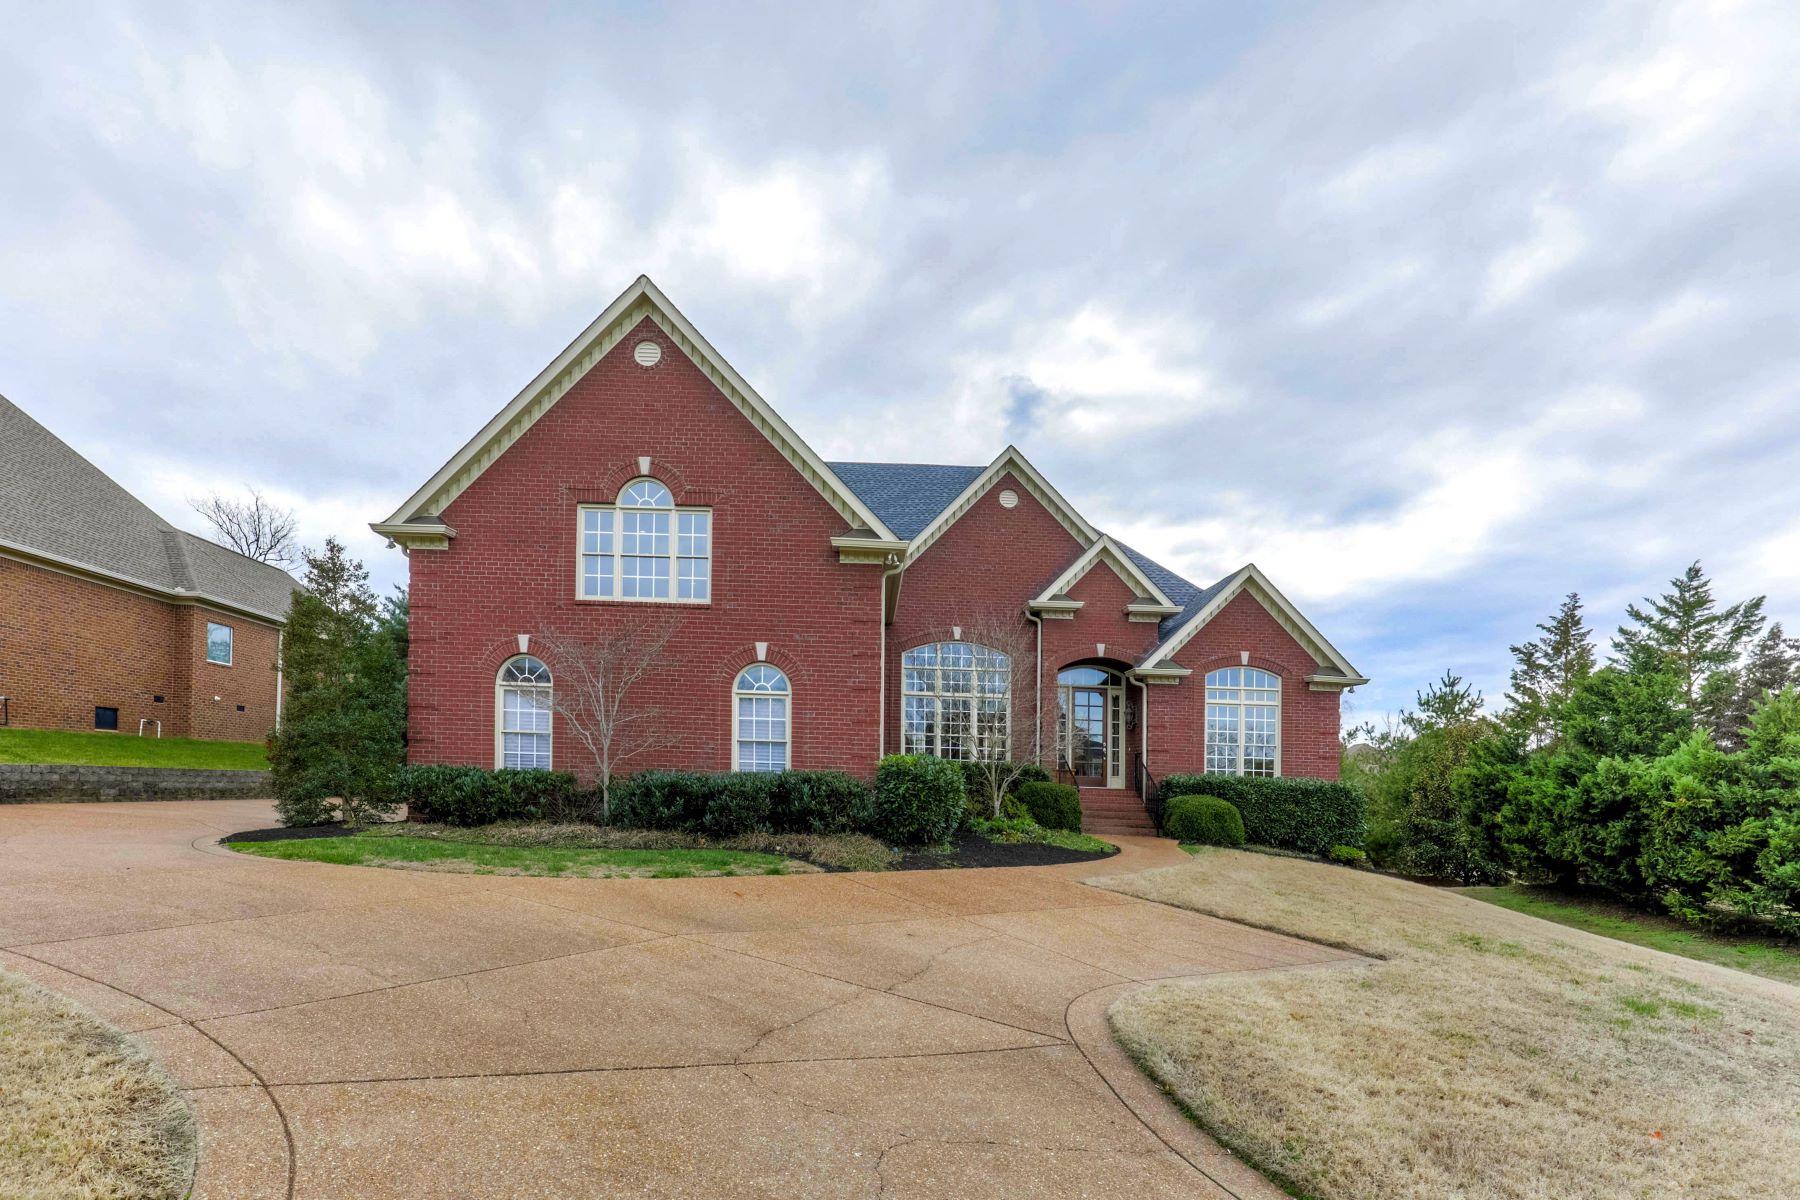 Maison unifamiliale pour l Vente à Traditional Brick in Brentwood 9703 Amethyst Lane Brentwood, Tennessee, 37027 États-Unis